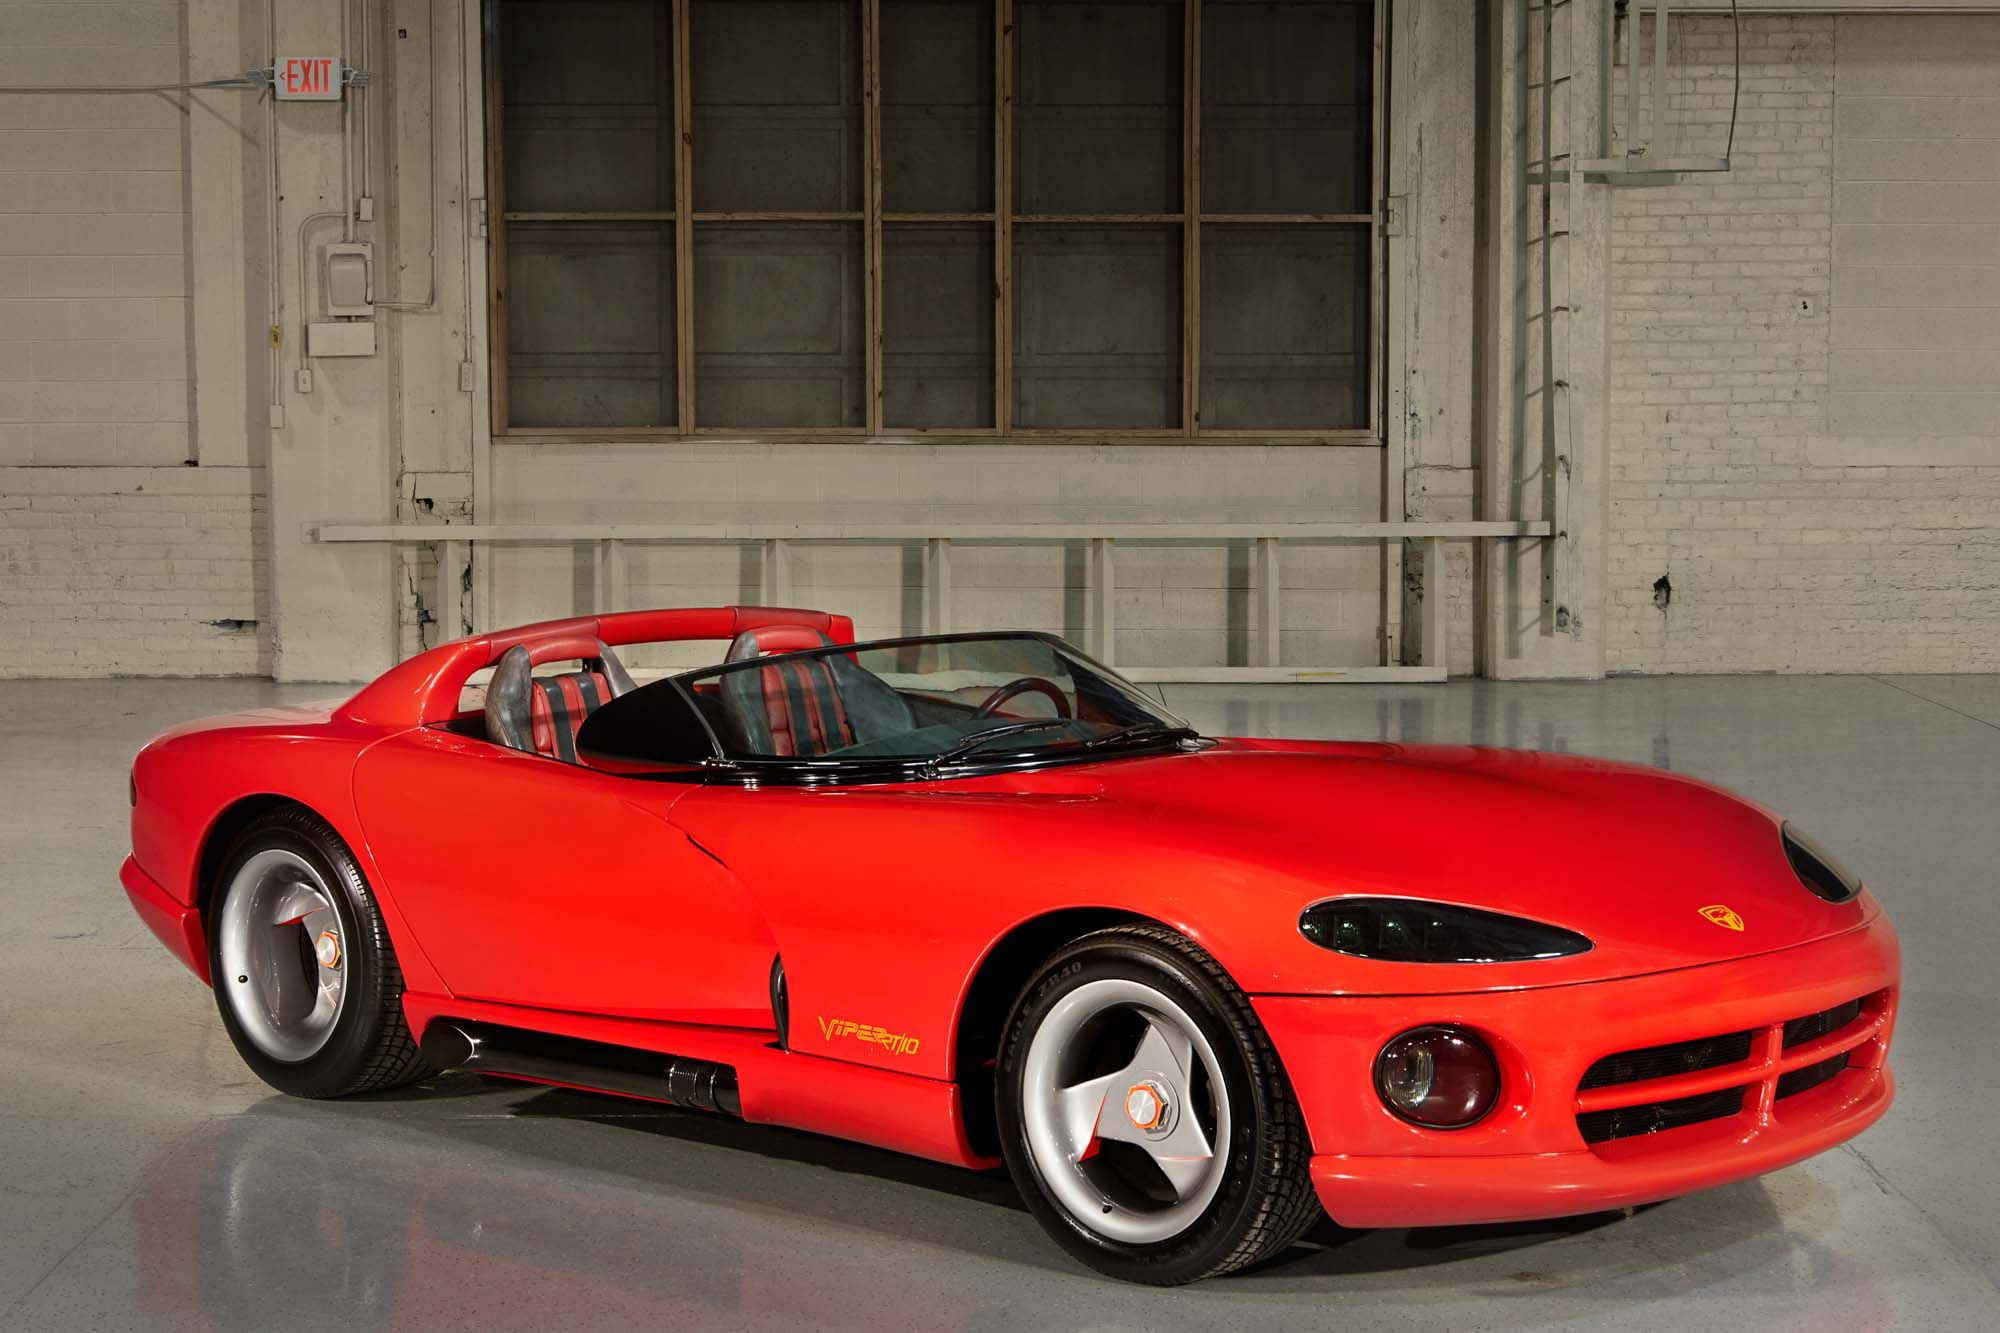 The First Dodge Viper Is A Brutal Bargain Dodge Viper Dodge Car